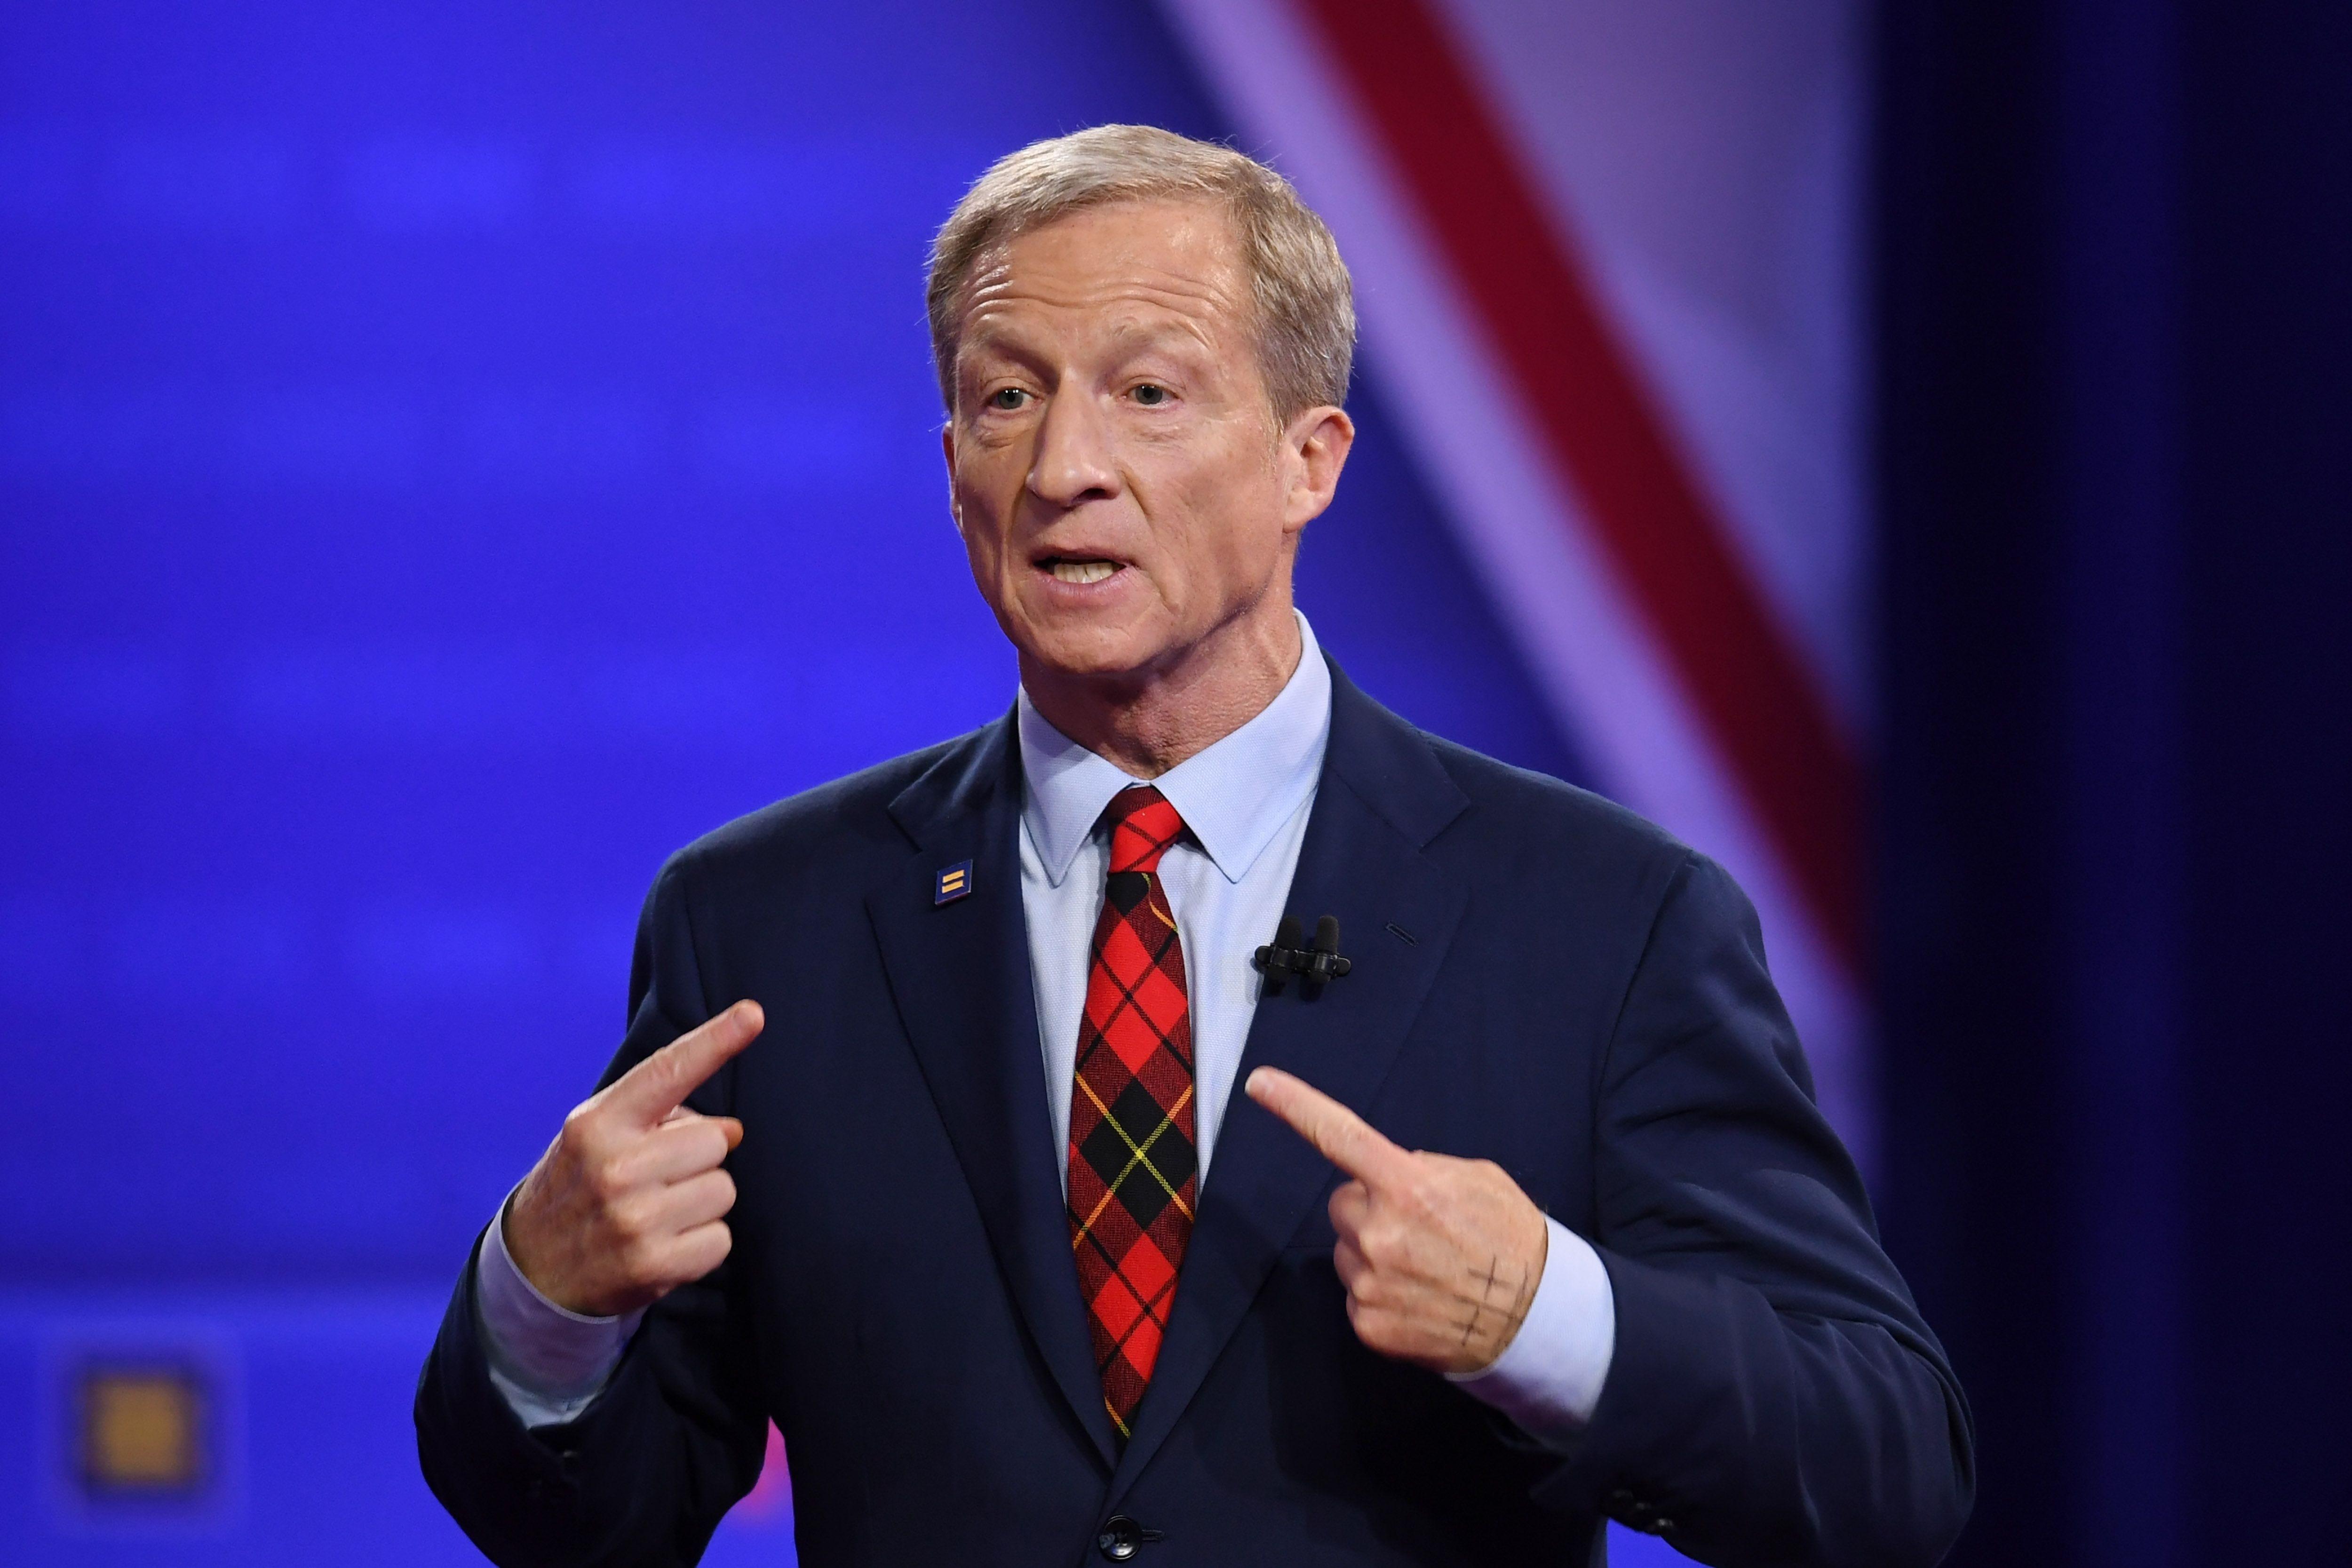 Twitter users, including Meghan McCain, critique Tom Steyer's tie during Democratic debate